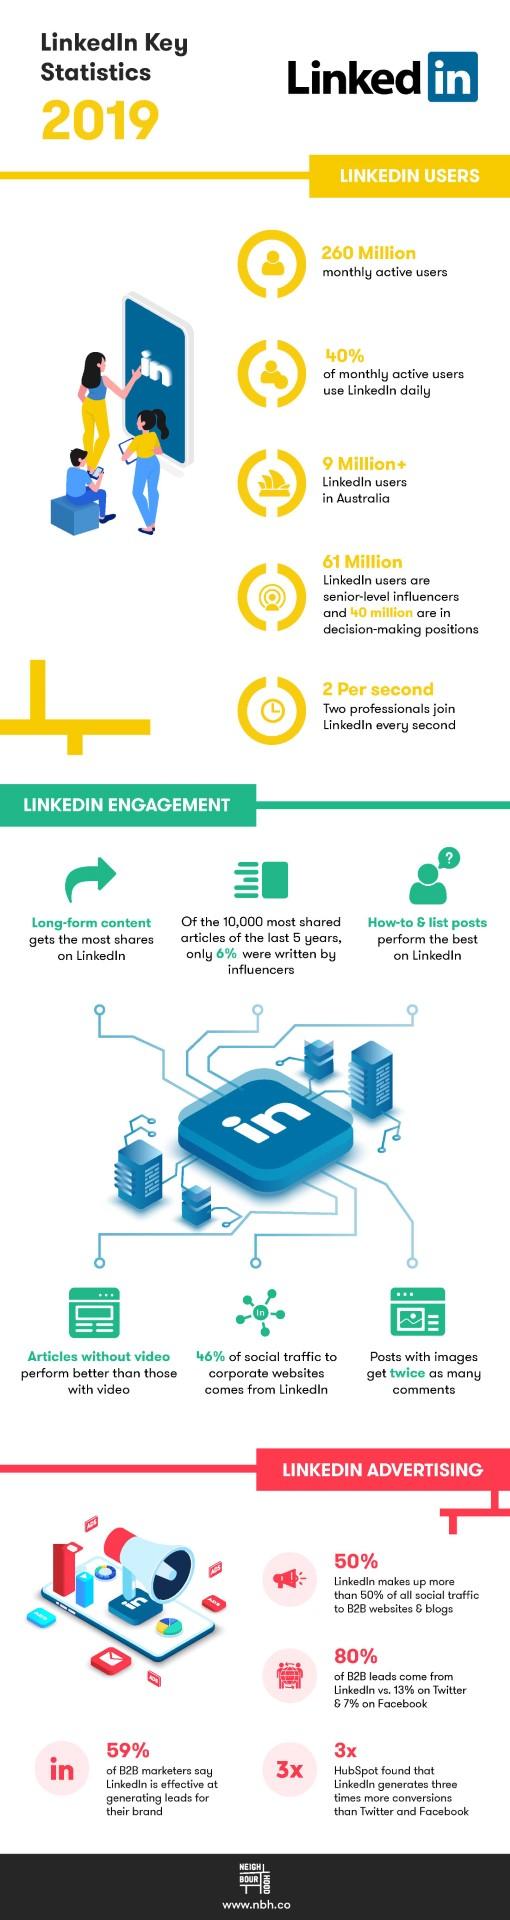 LinkedIn-Statistics-Infographic-2019